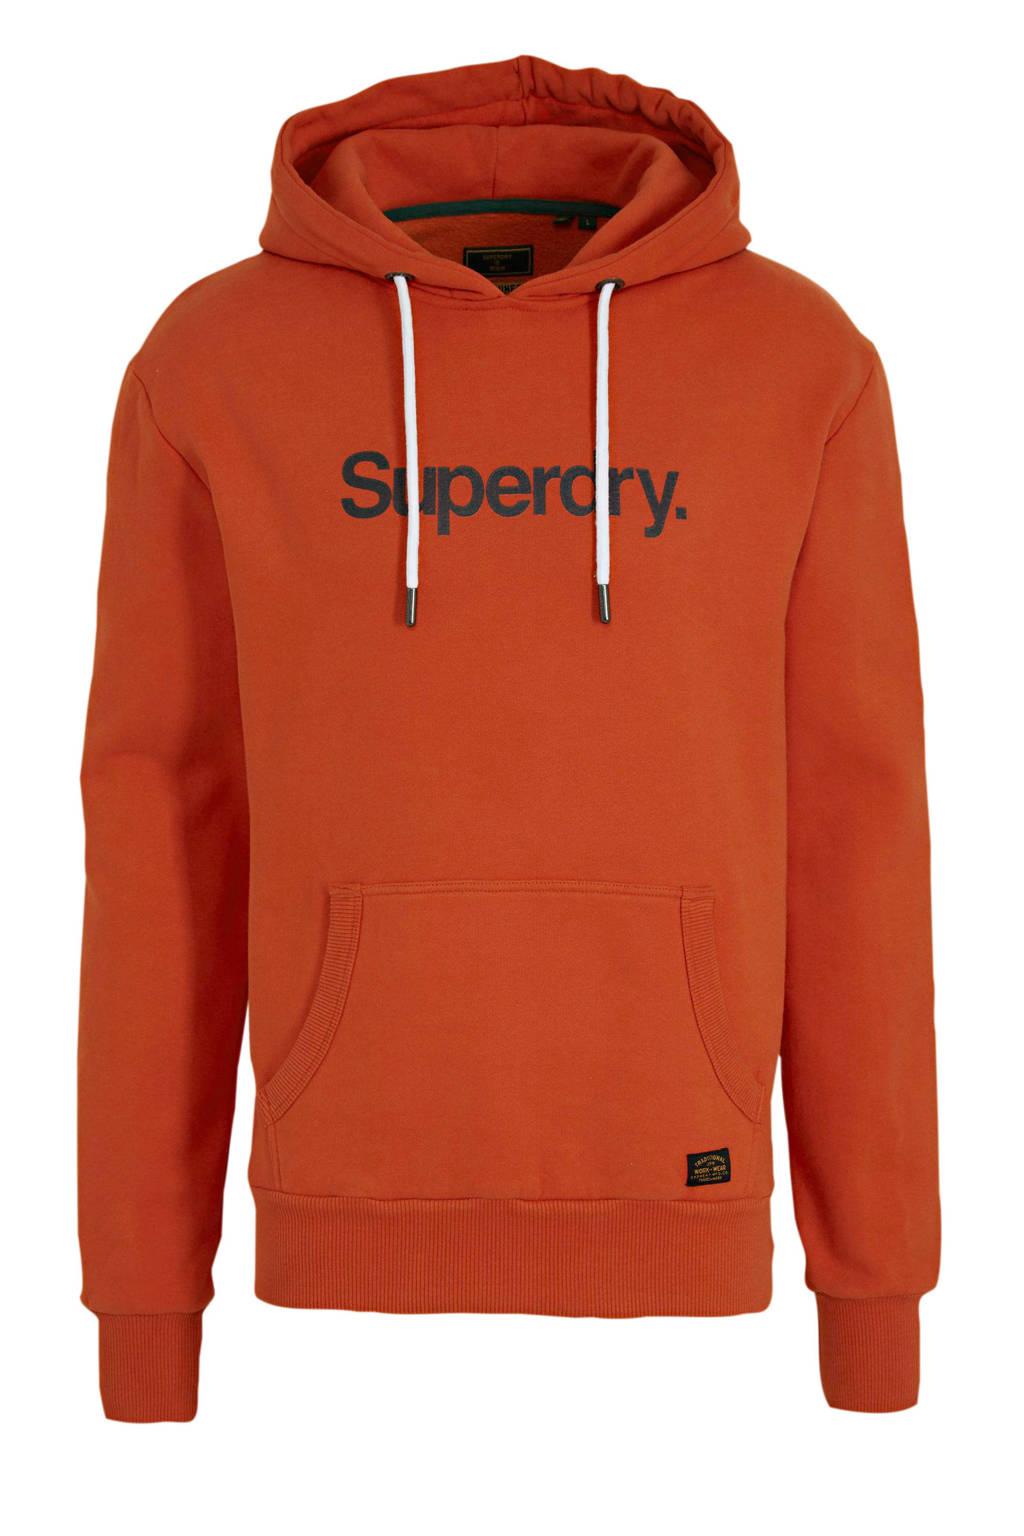 Superdry hoodie met logo brique, Brique